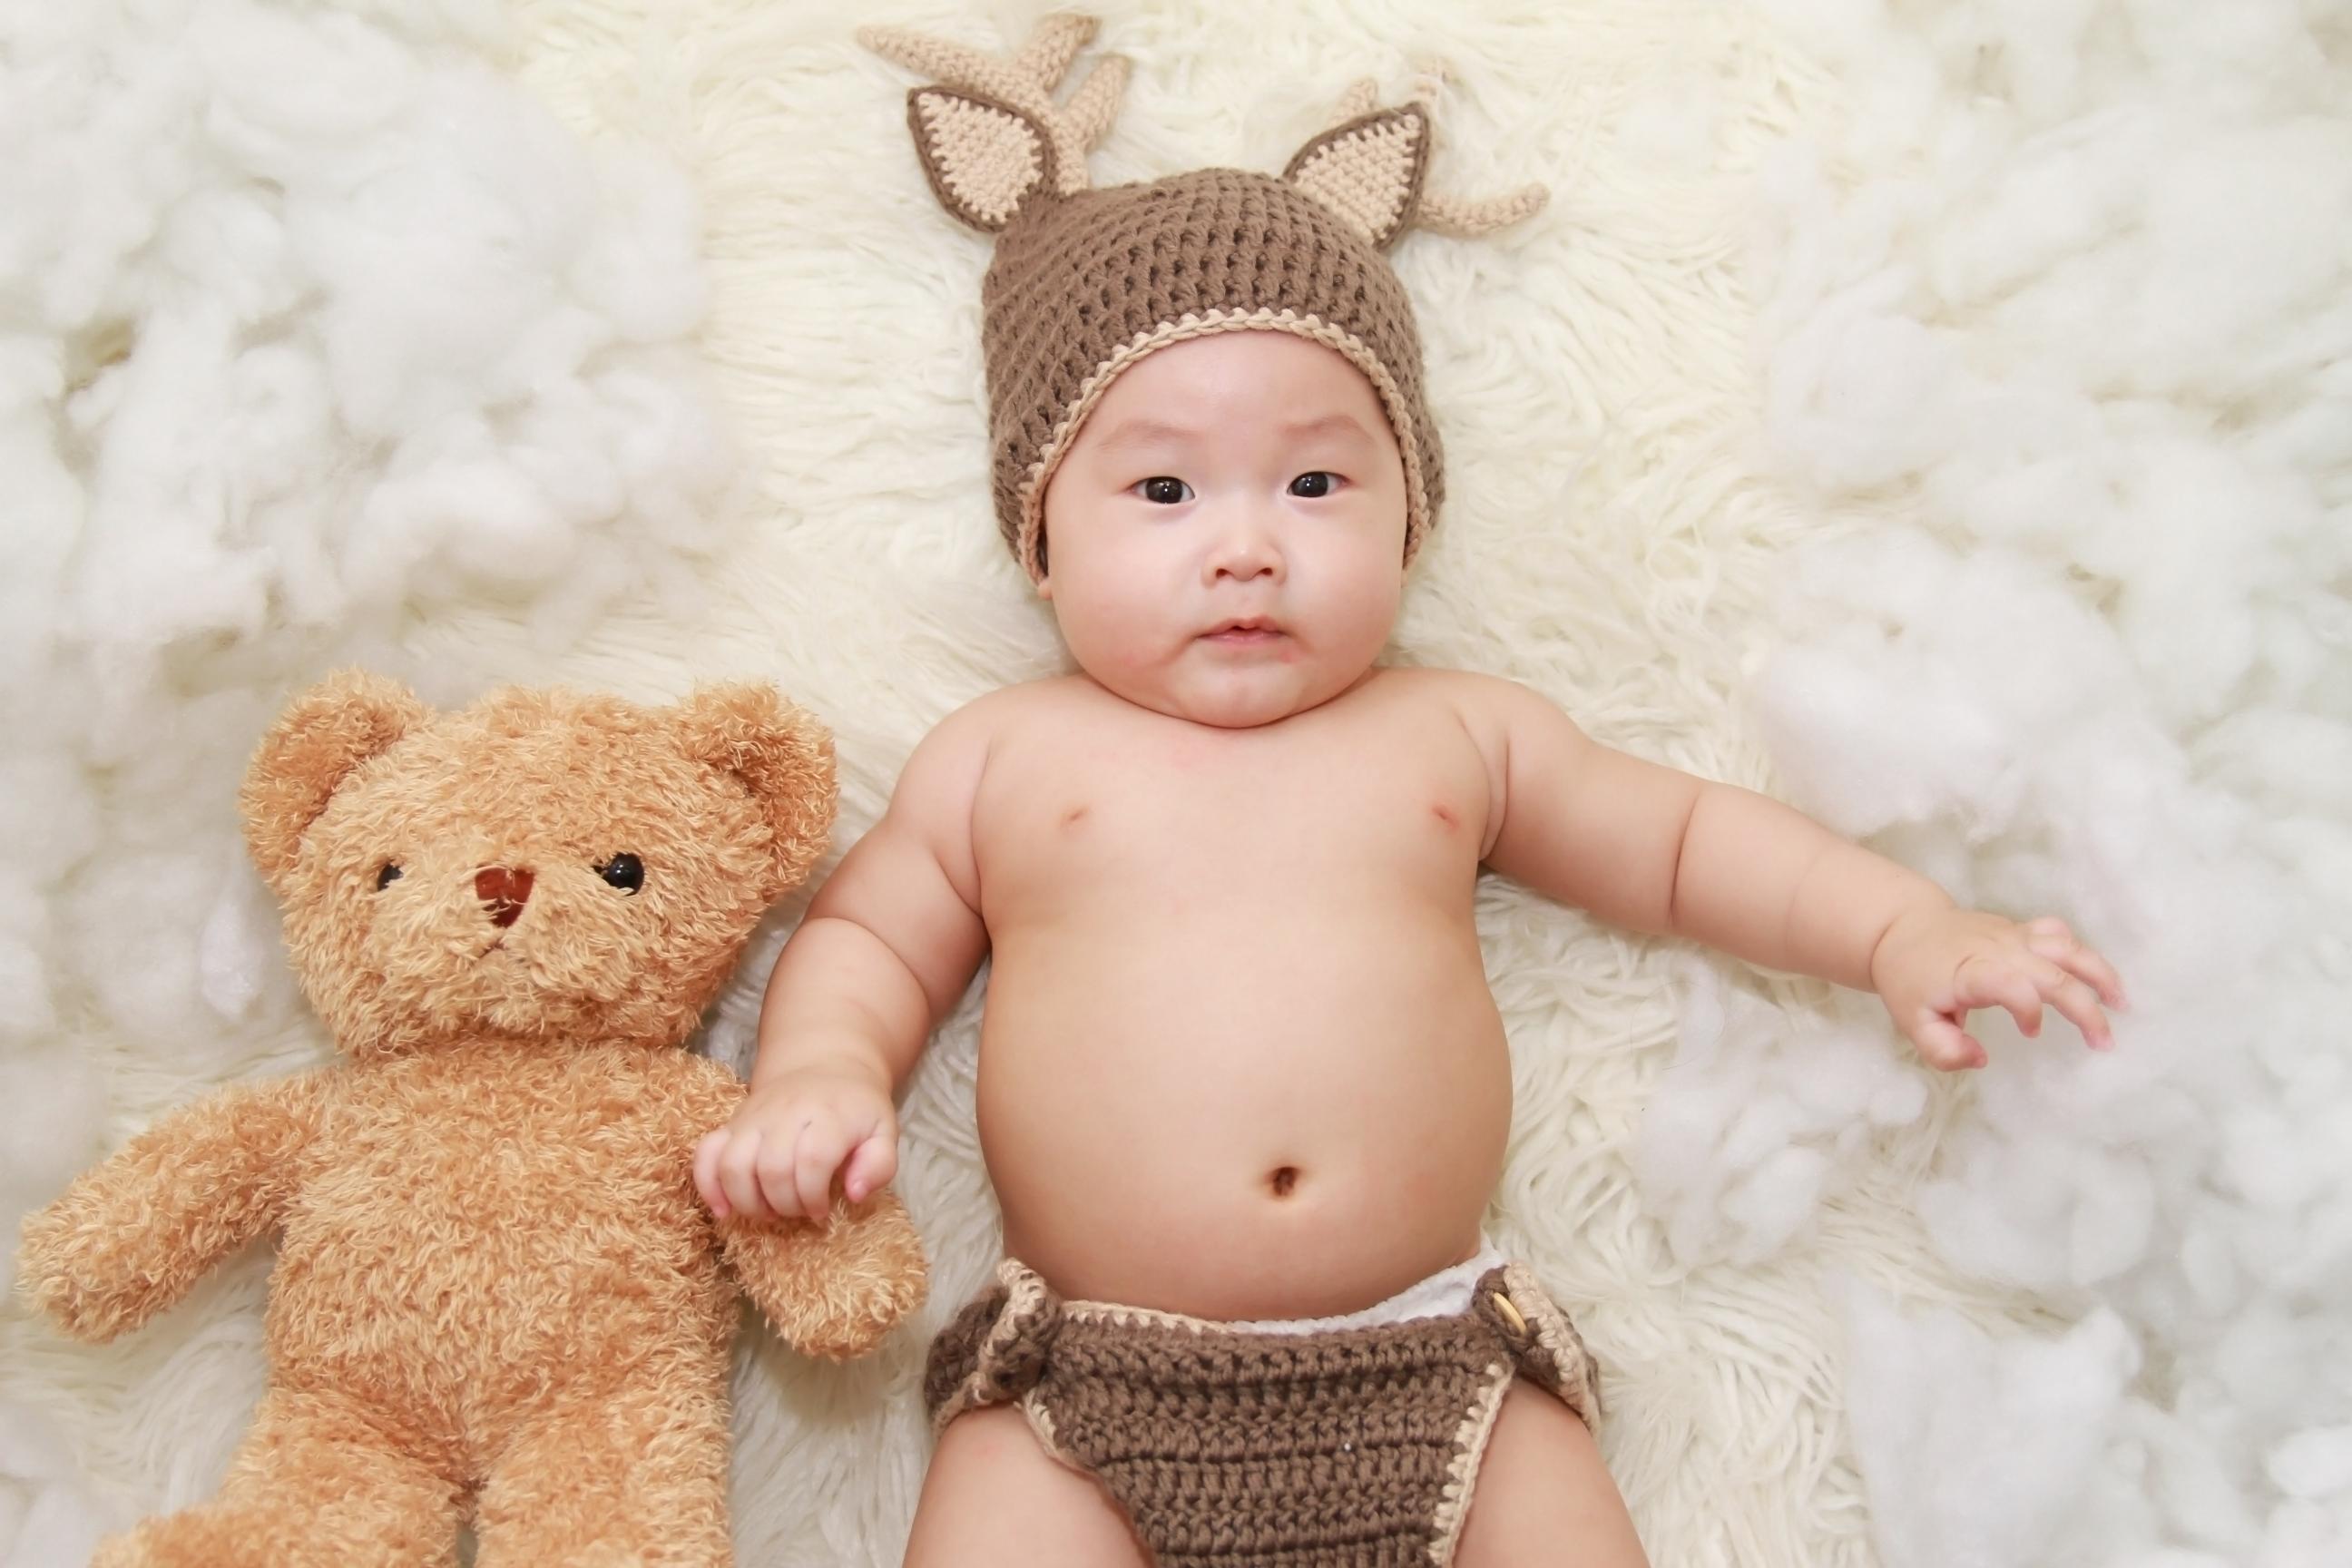 baby lying on white cushion beside brown bear plush toy